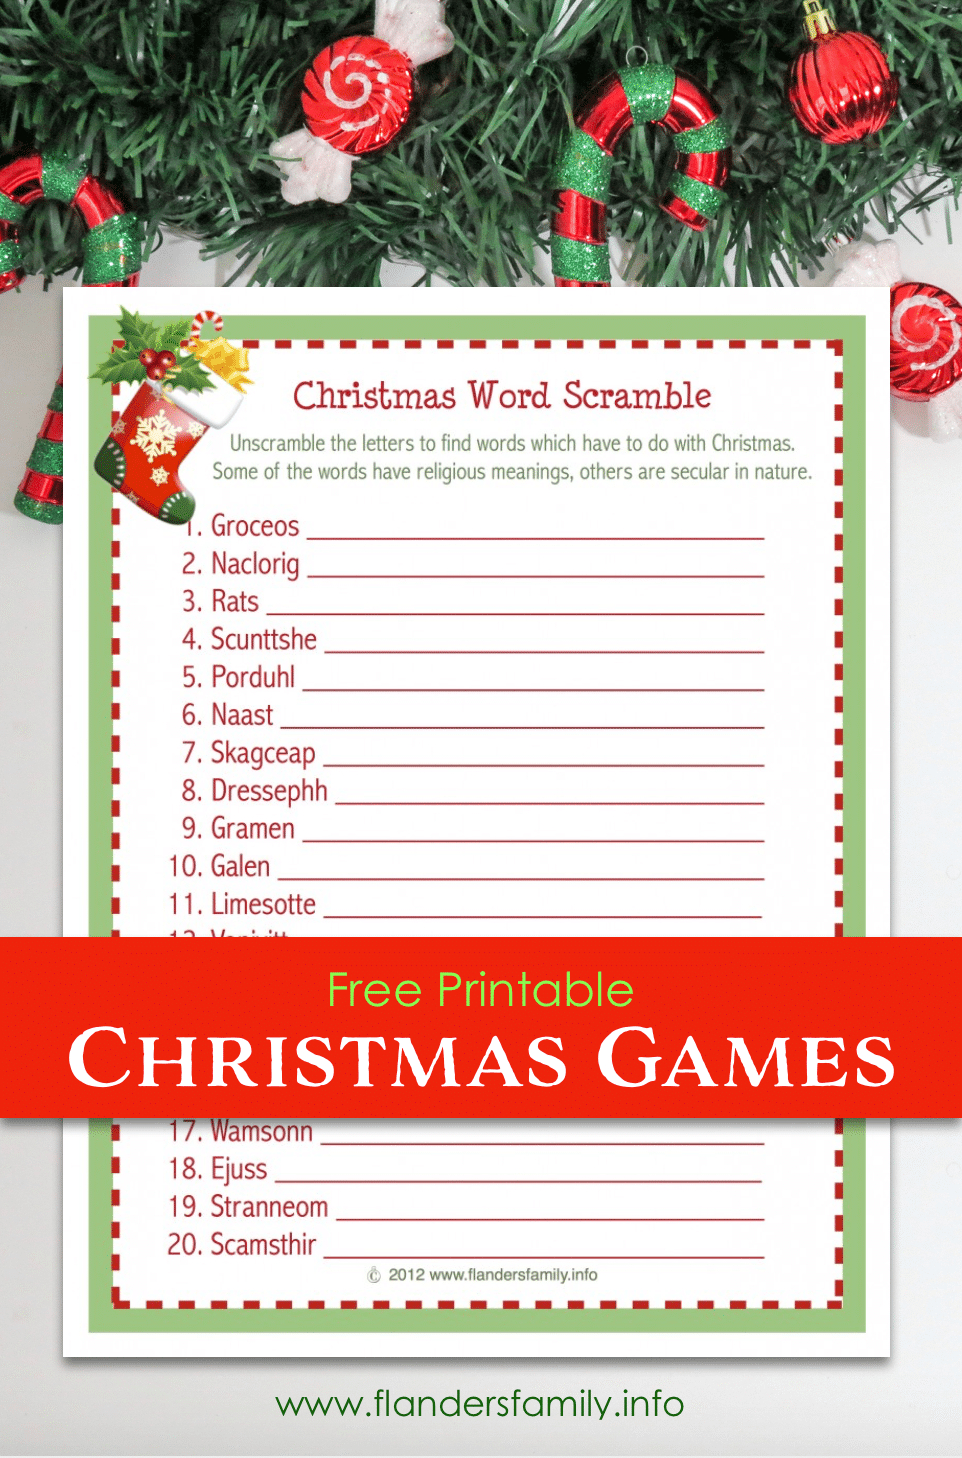 Christmas Word Scramble (Free Printable) - Flanders Family Homelife - Free Printable Christmas Word Games